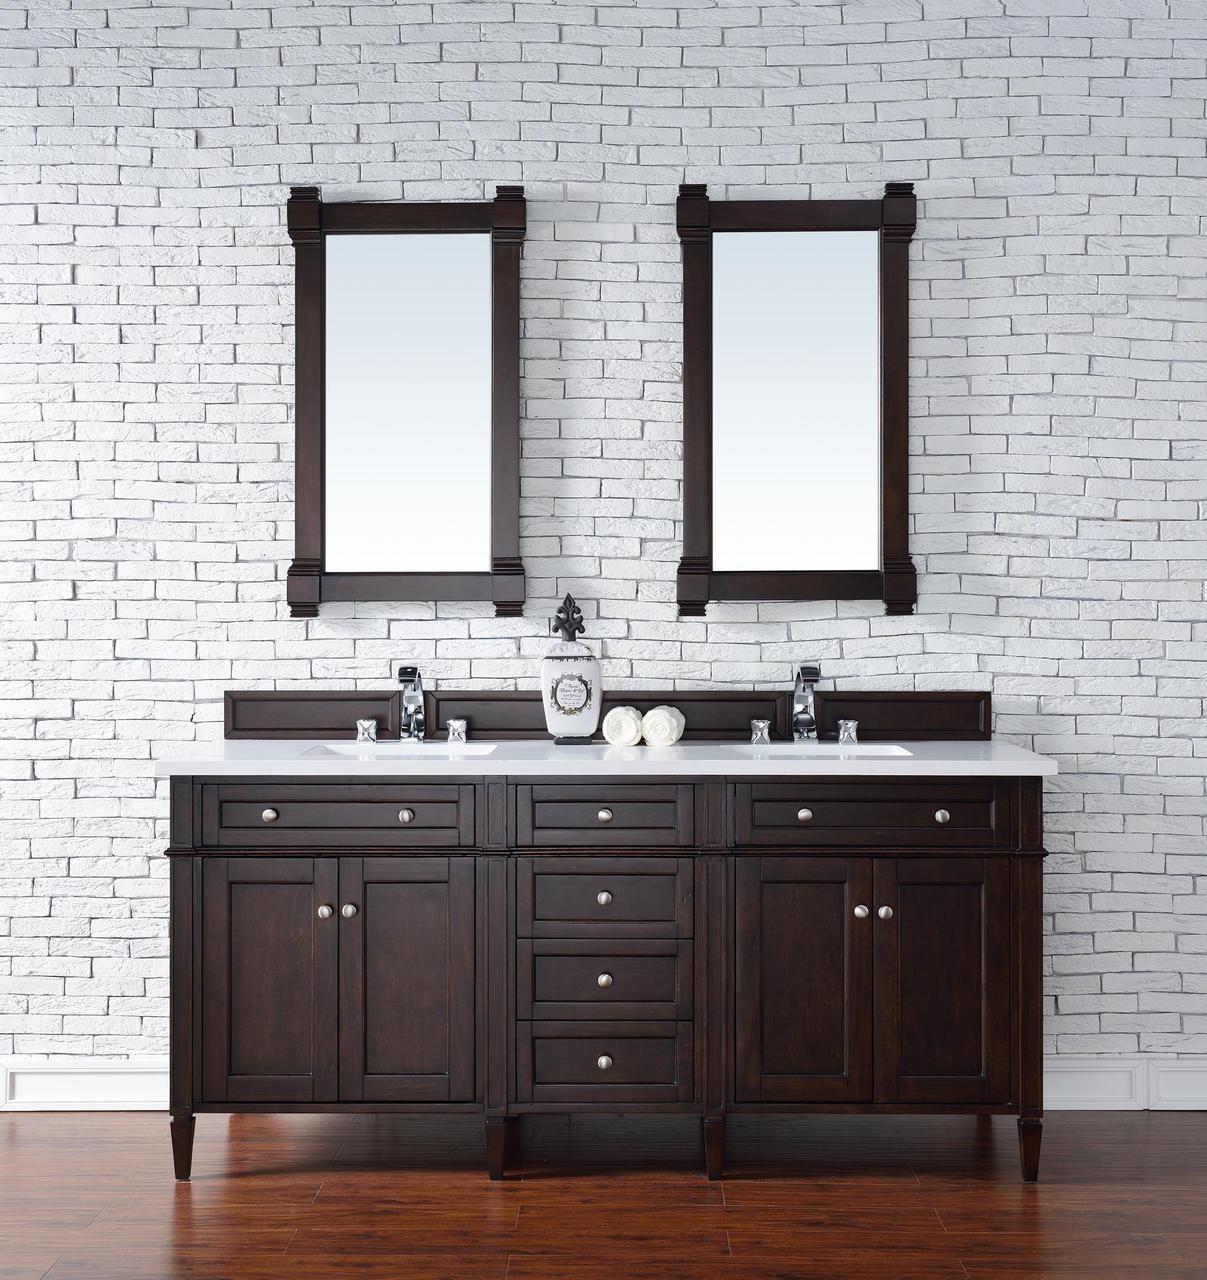 Contemporary 72 Inch Double Sink Bathroom Vanity Mahogany Finish No Top